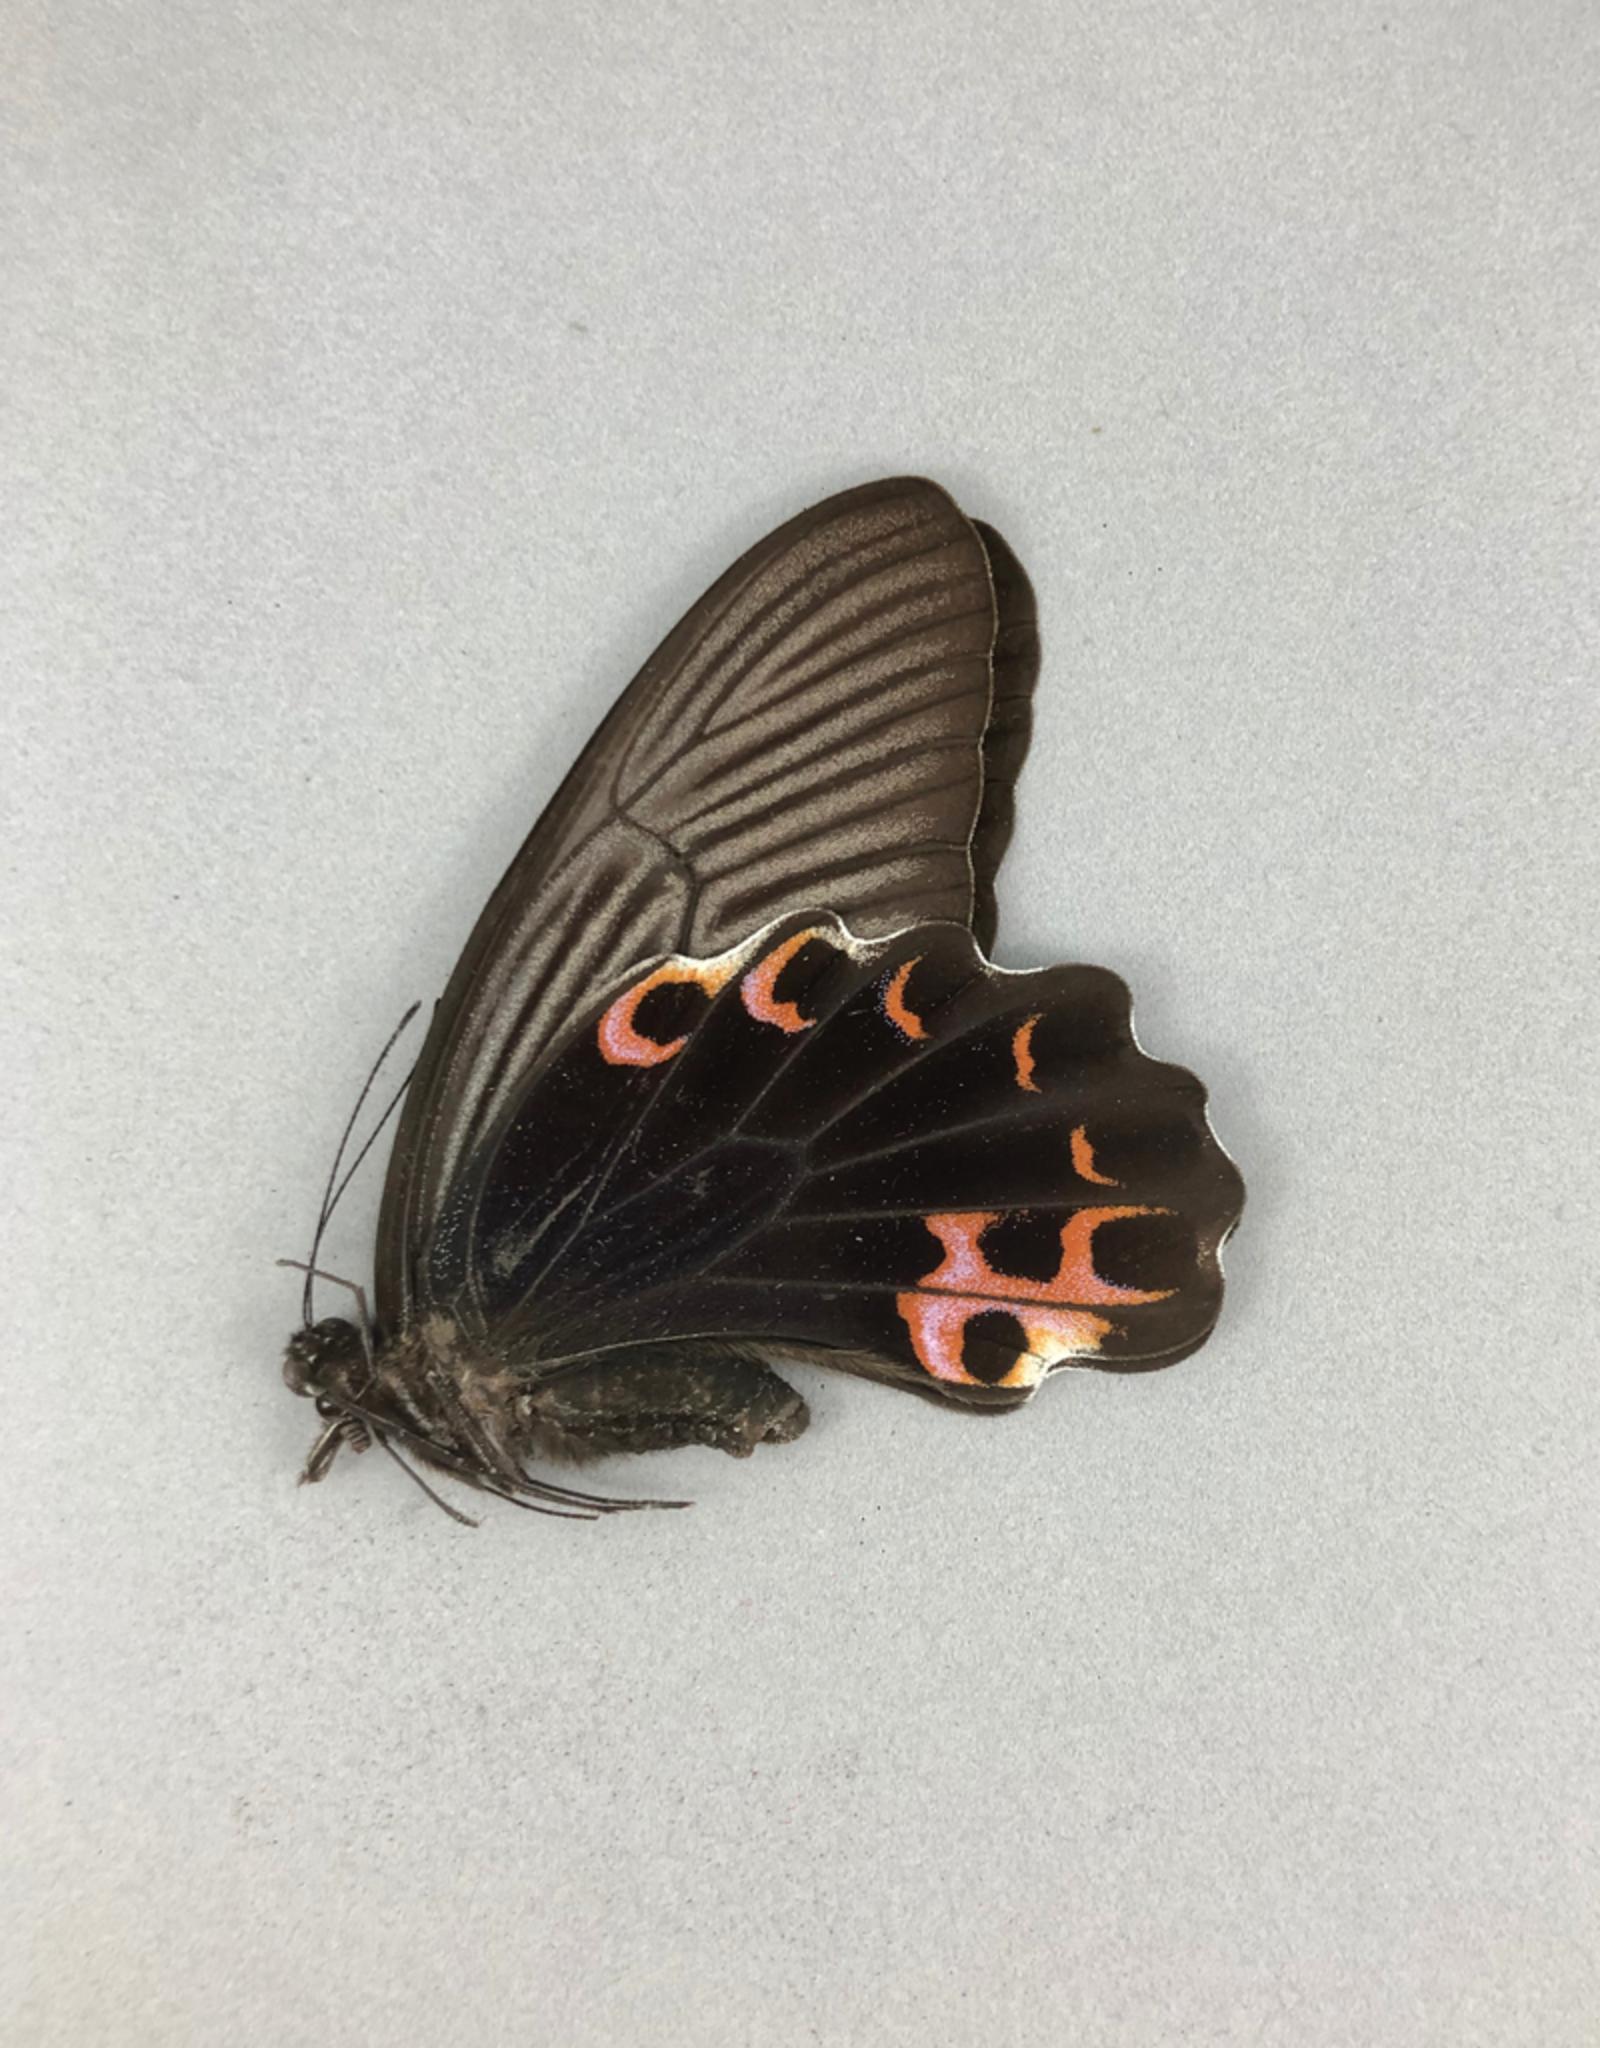 Papilio protenor amaurus F A1 Taiwan